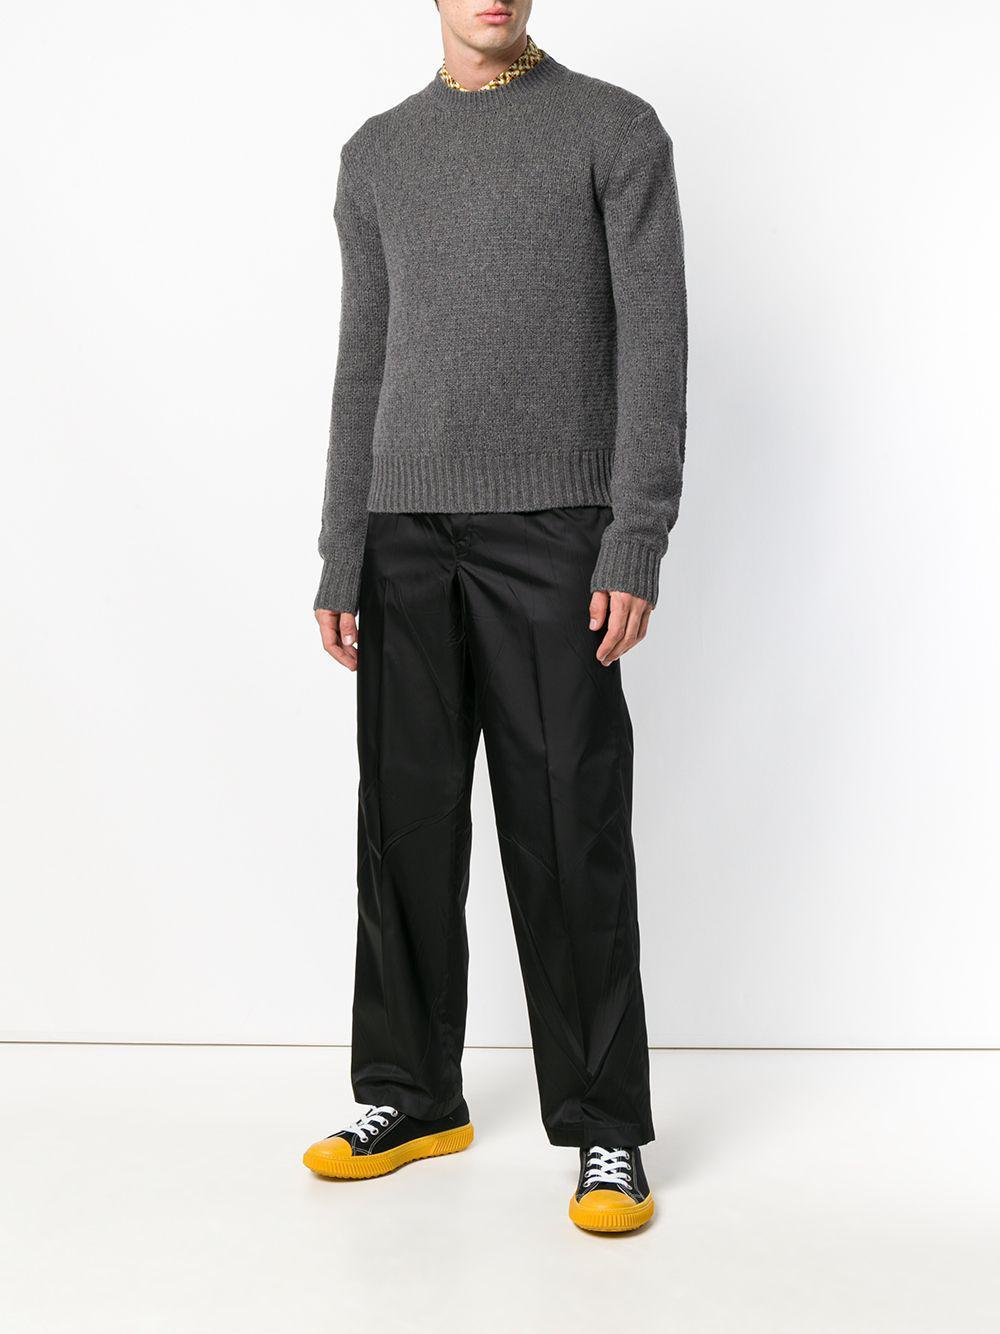 75fc87906816 Lyst - Prada Collar Insert Sweater in Gray for Men